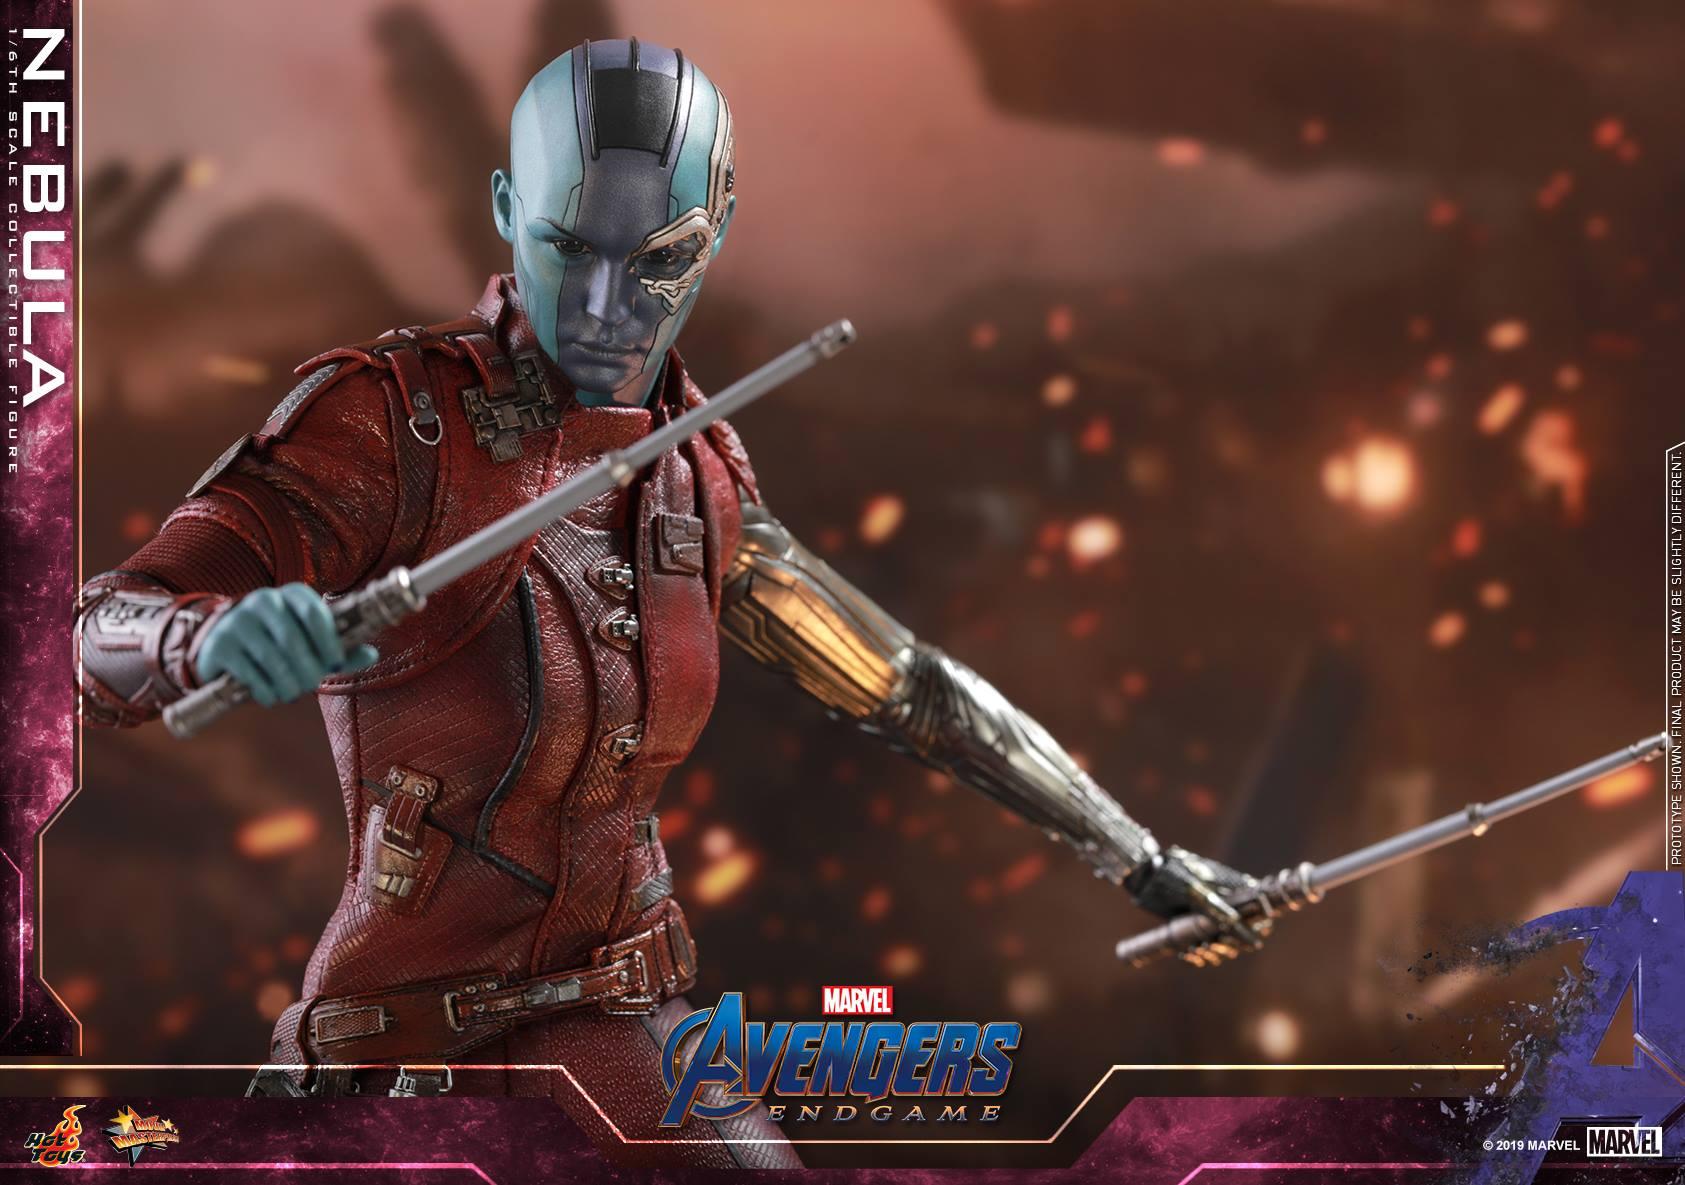 szmk_avengers_endgame_vegjatek_bosszuallok_marvel_nebula_warmaschine_harcigep_4.jpg